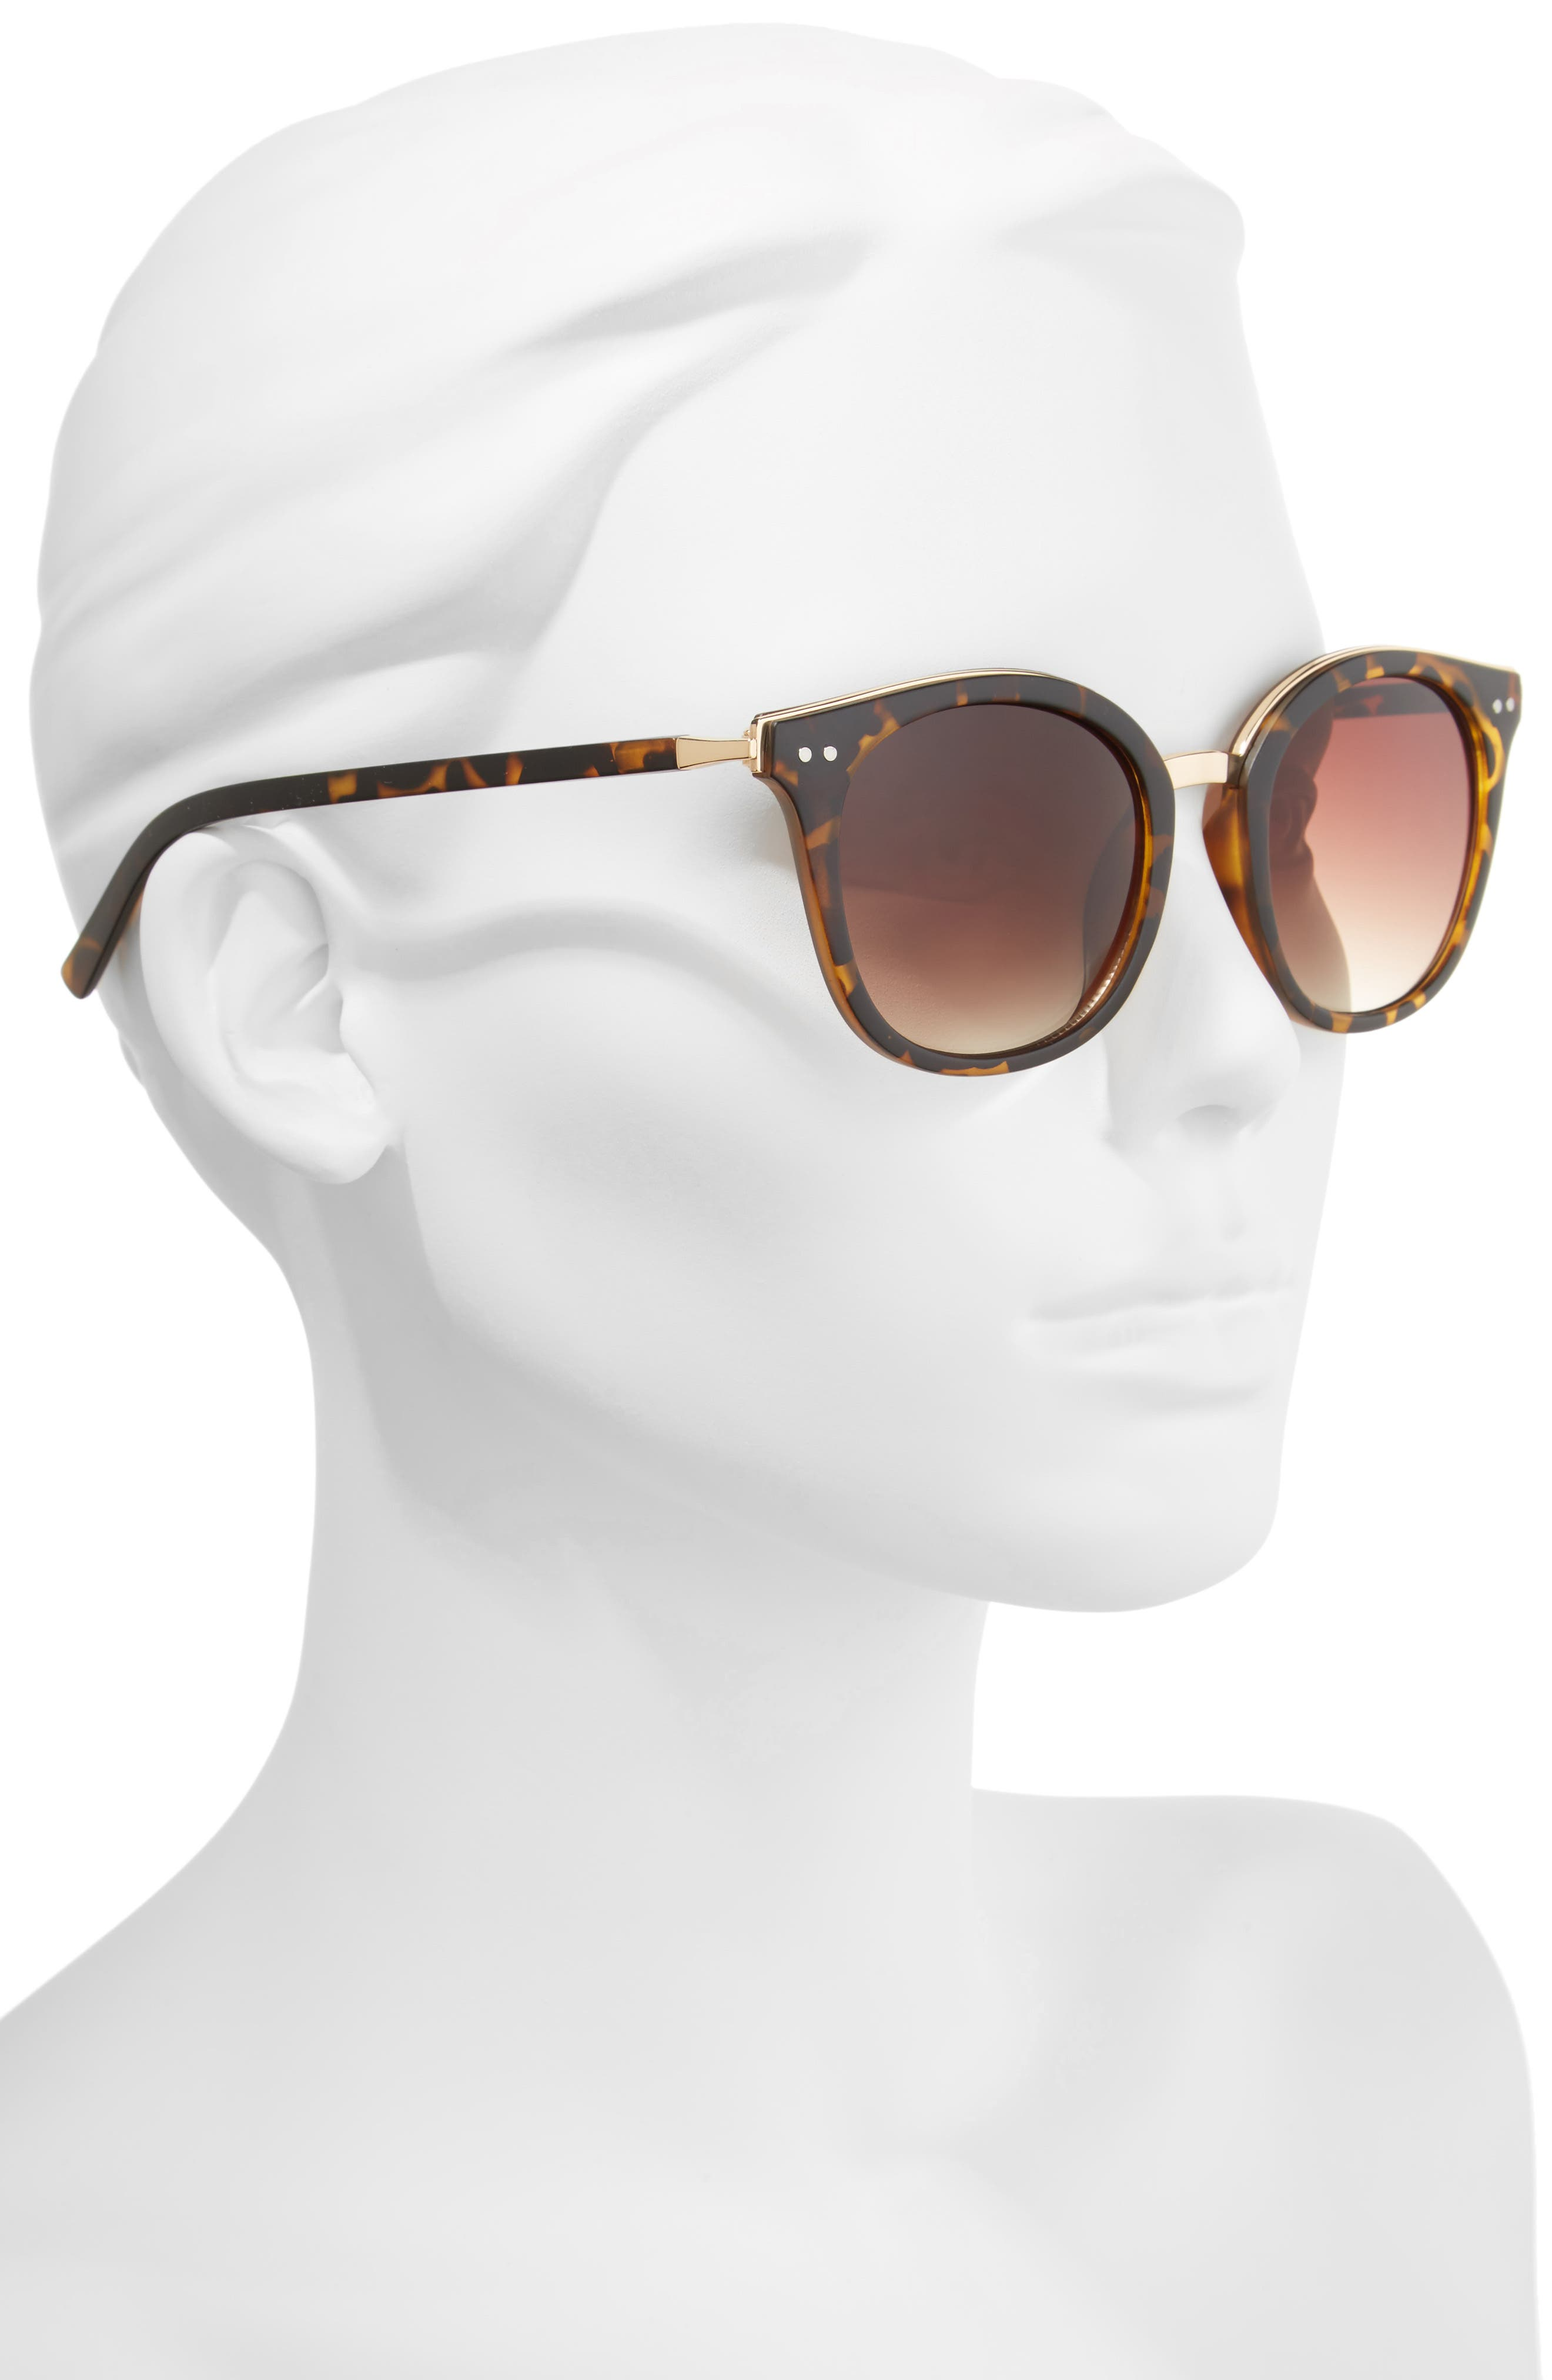 Metal Rim Round Sunglasses,                             Alternate thumbnail 2, color,                             200